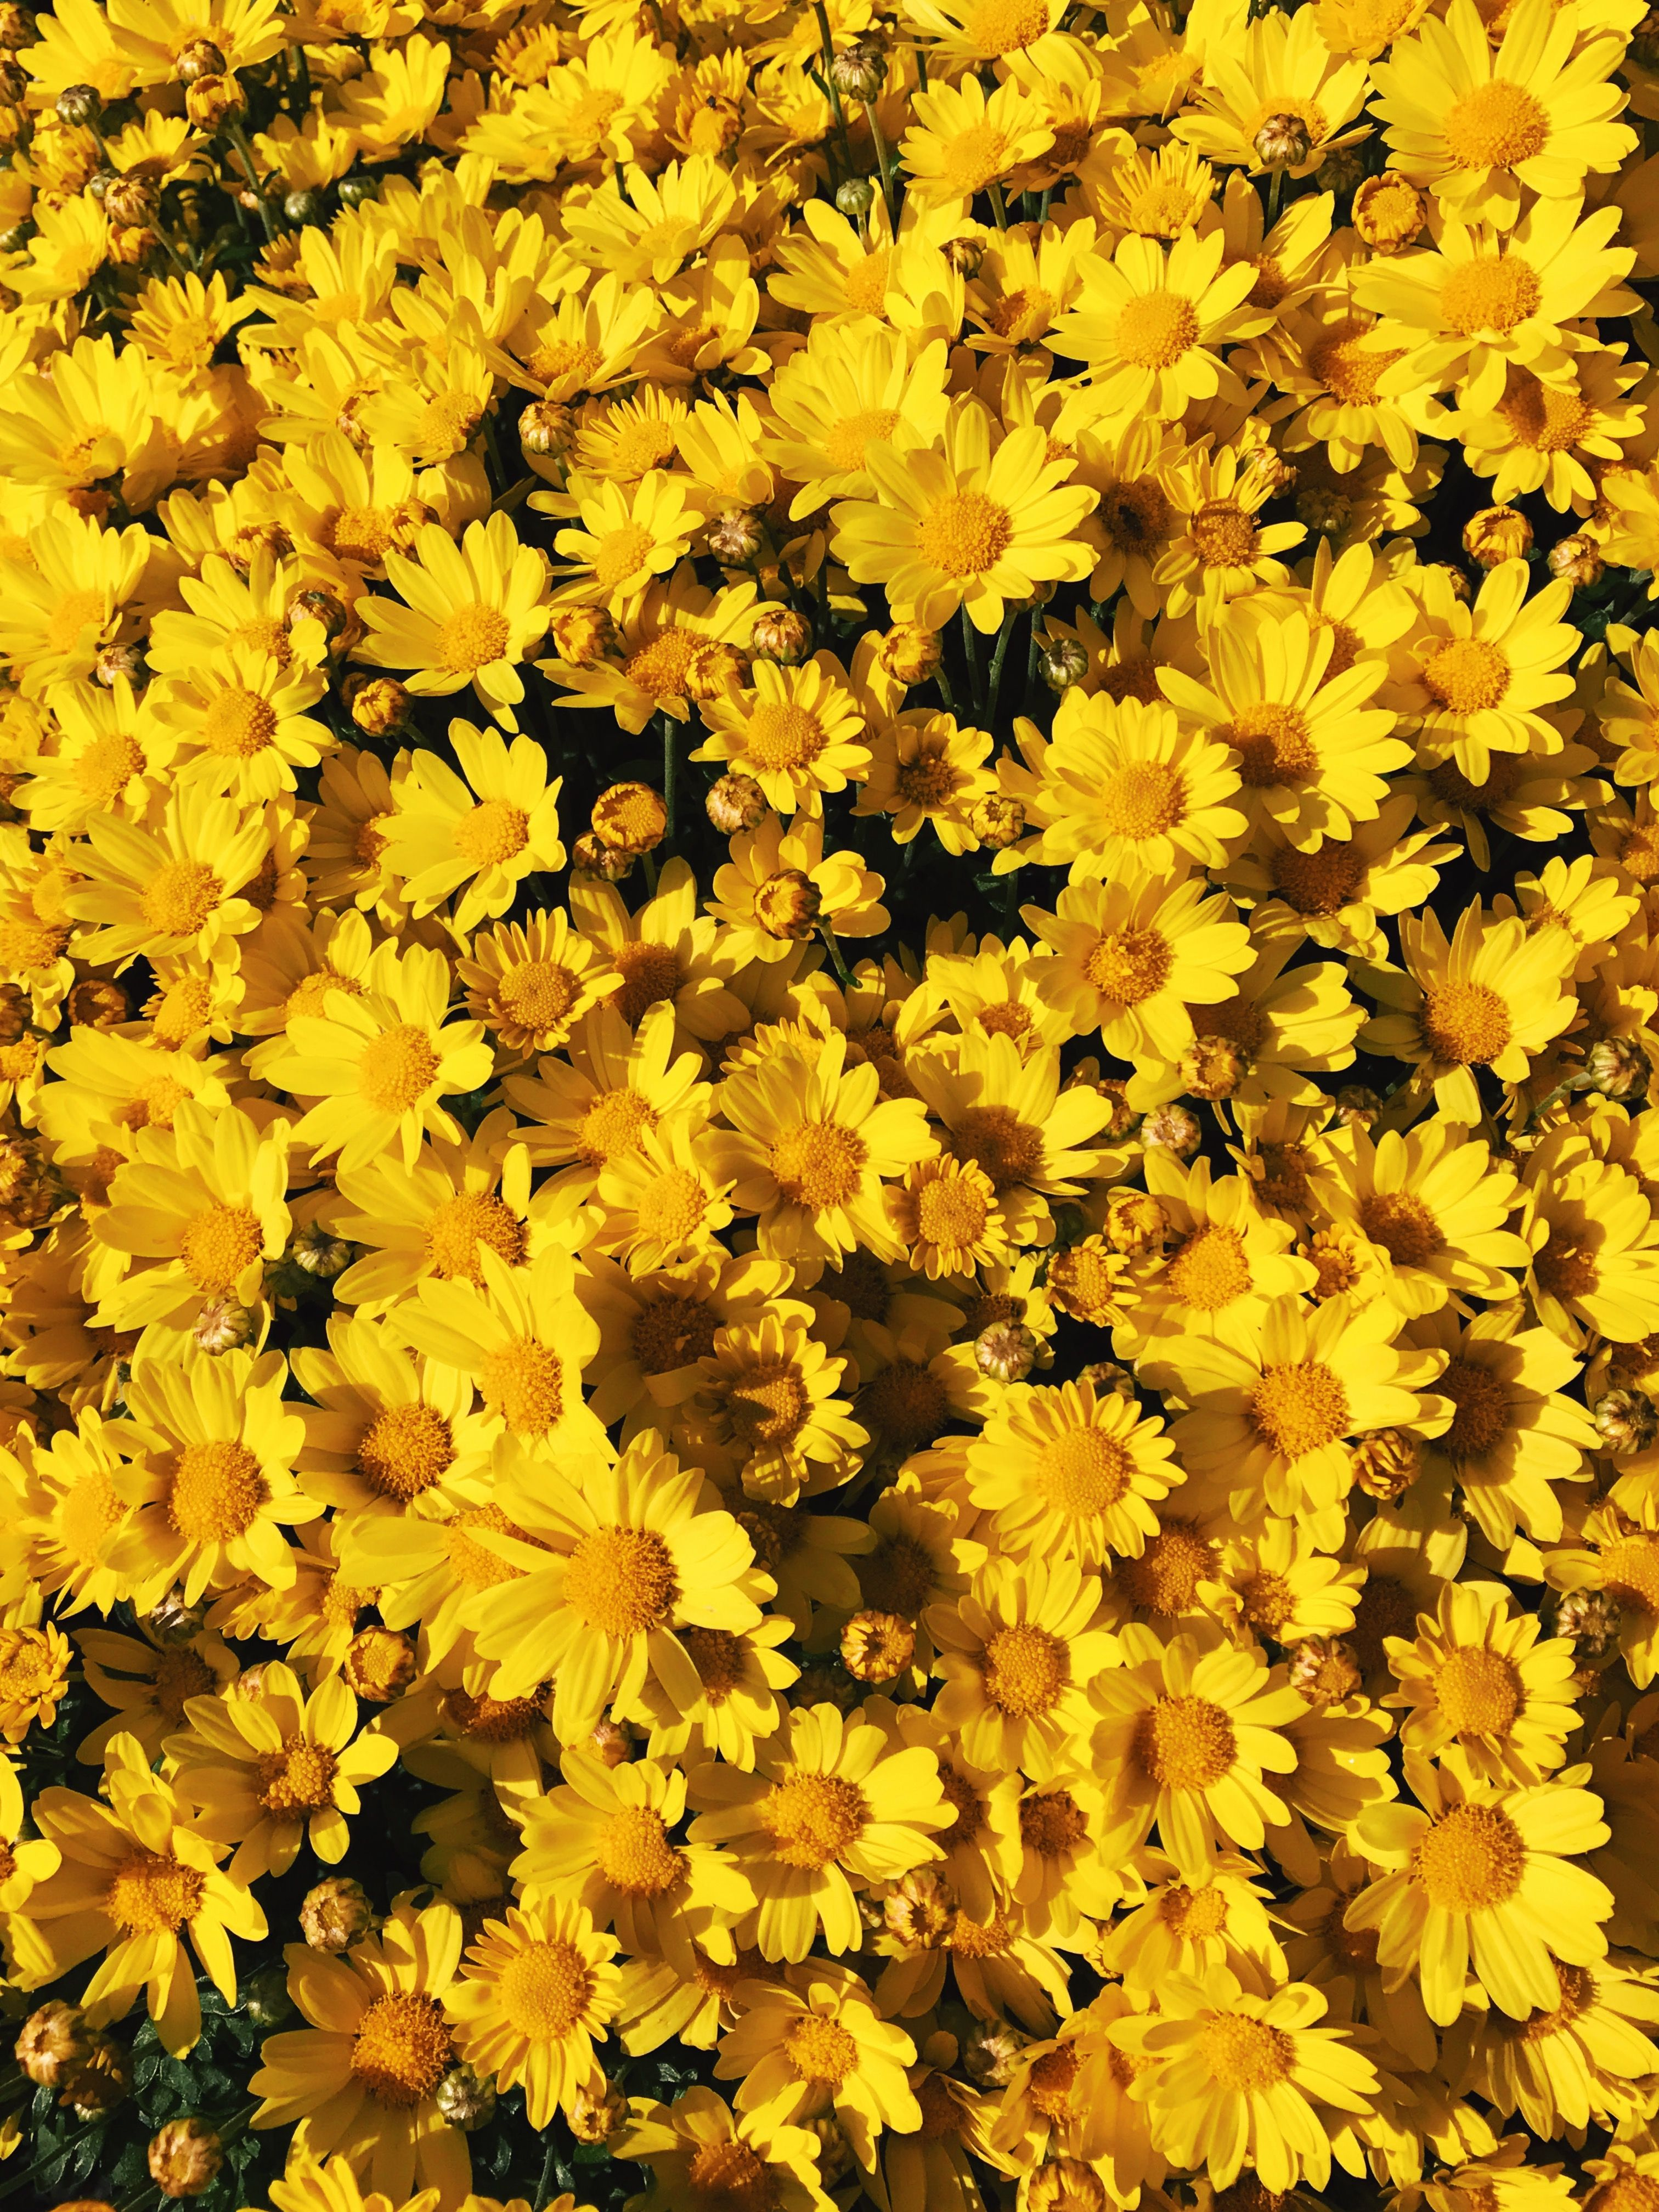 Get Yellow Flowers Wallpaper Aesthetic JPG